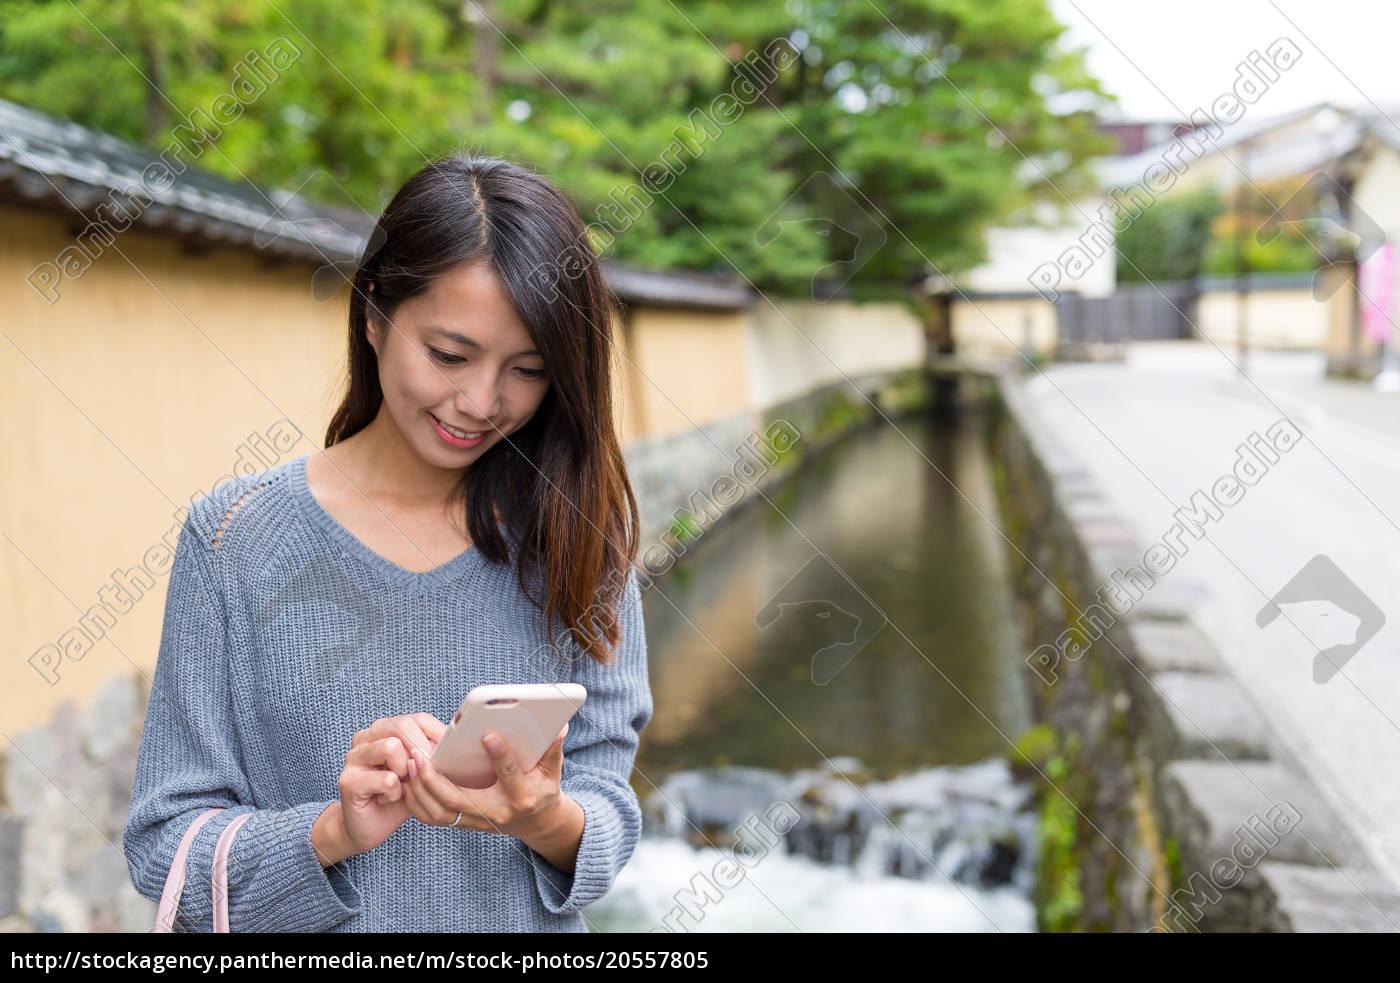 woman, use, of, cellphone, in, kanazawa - 20557805